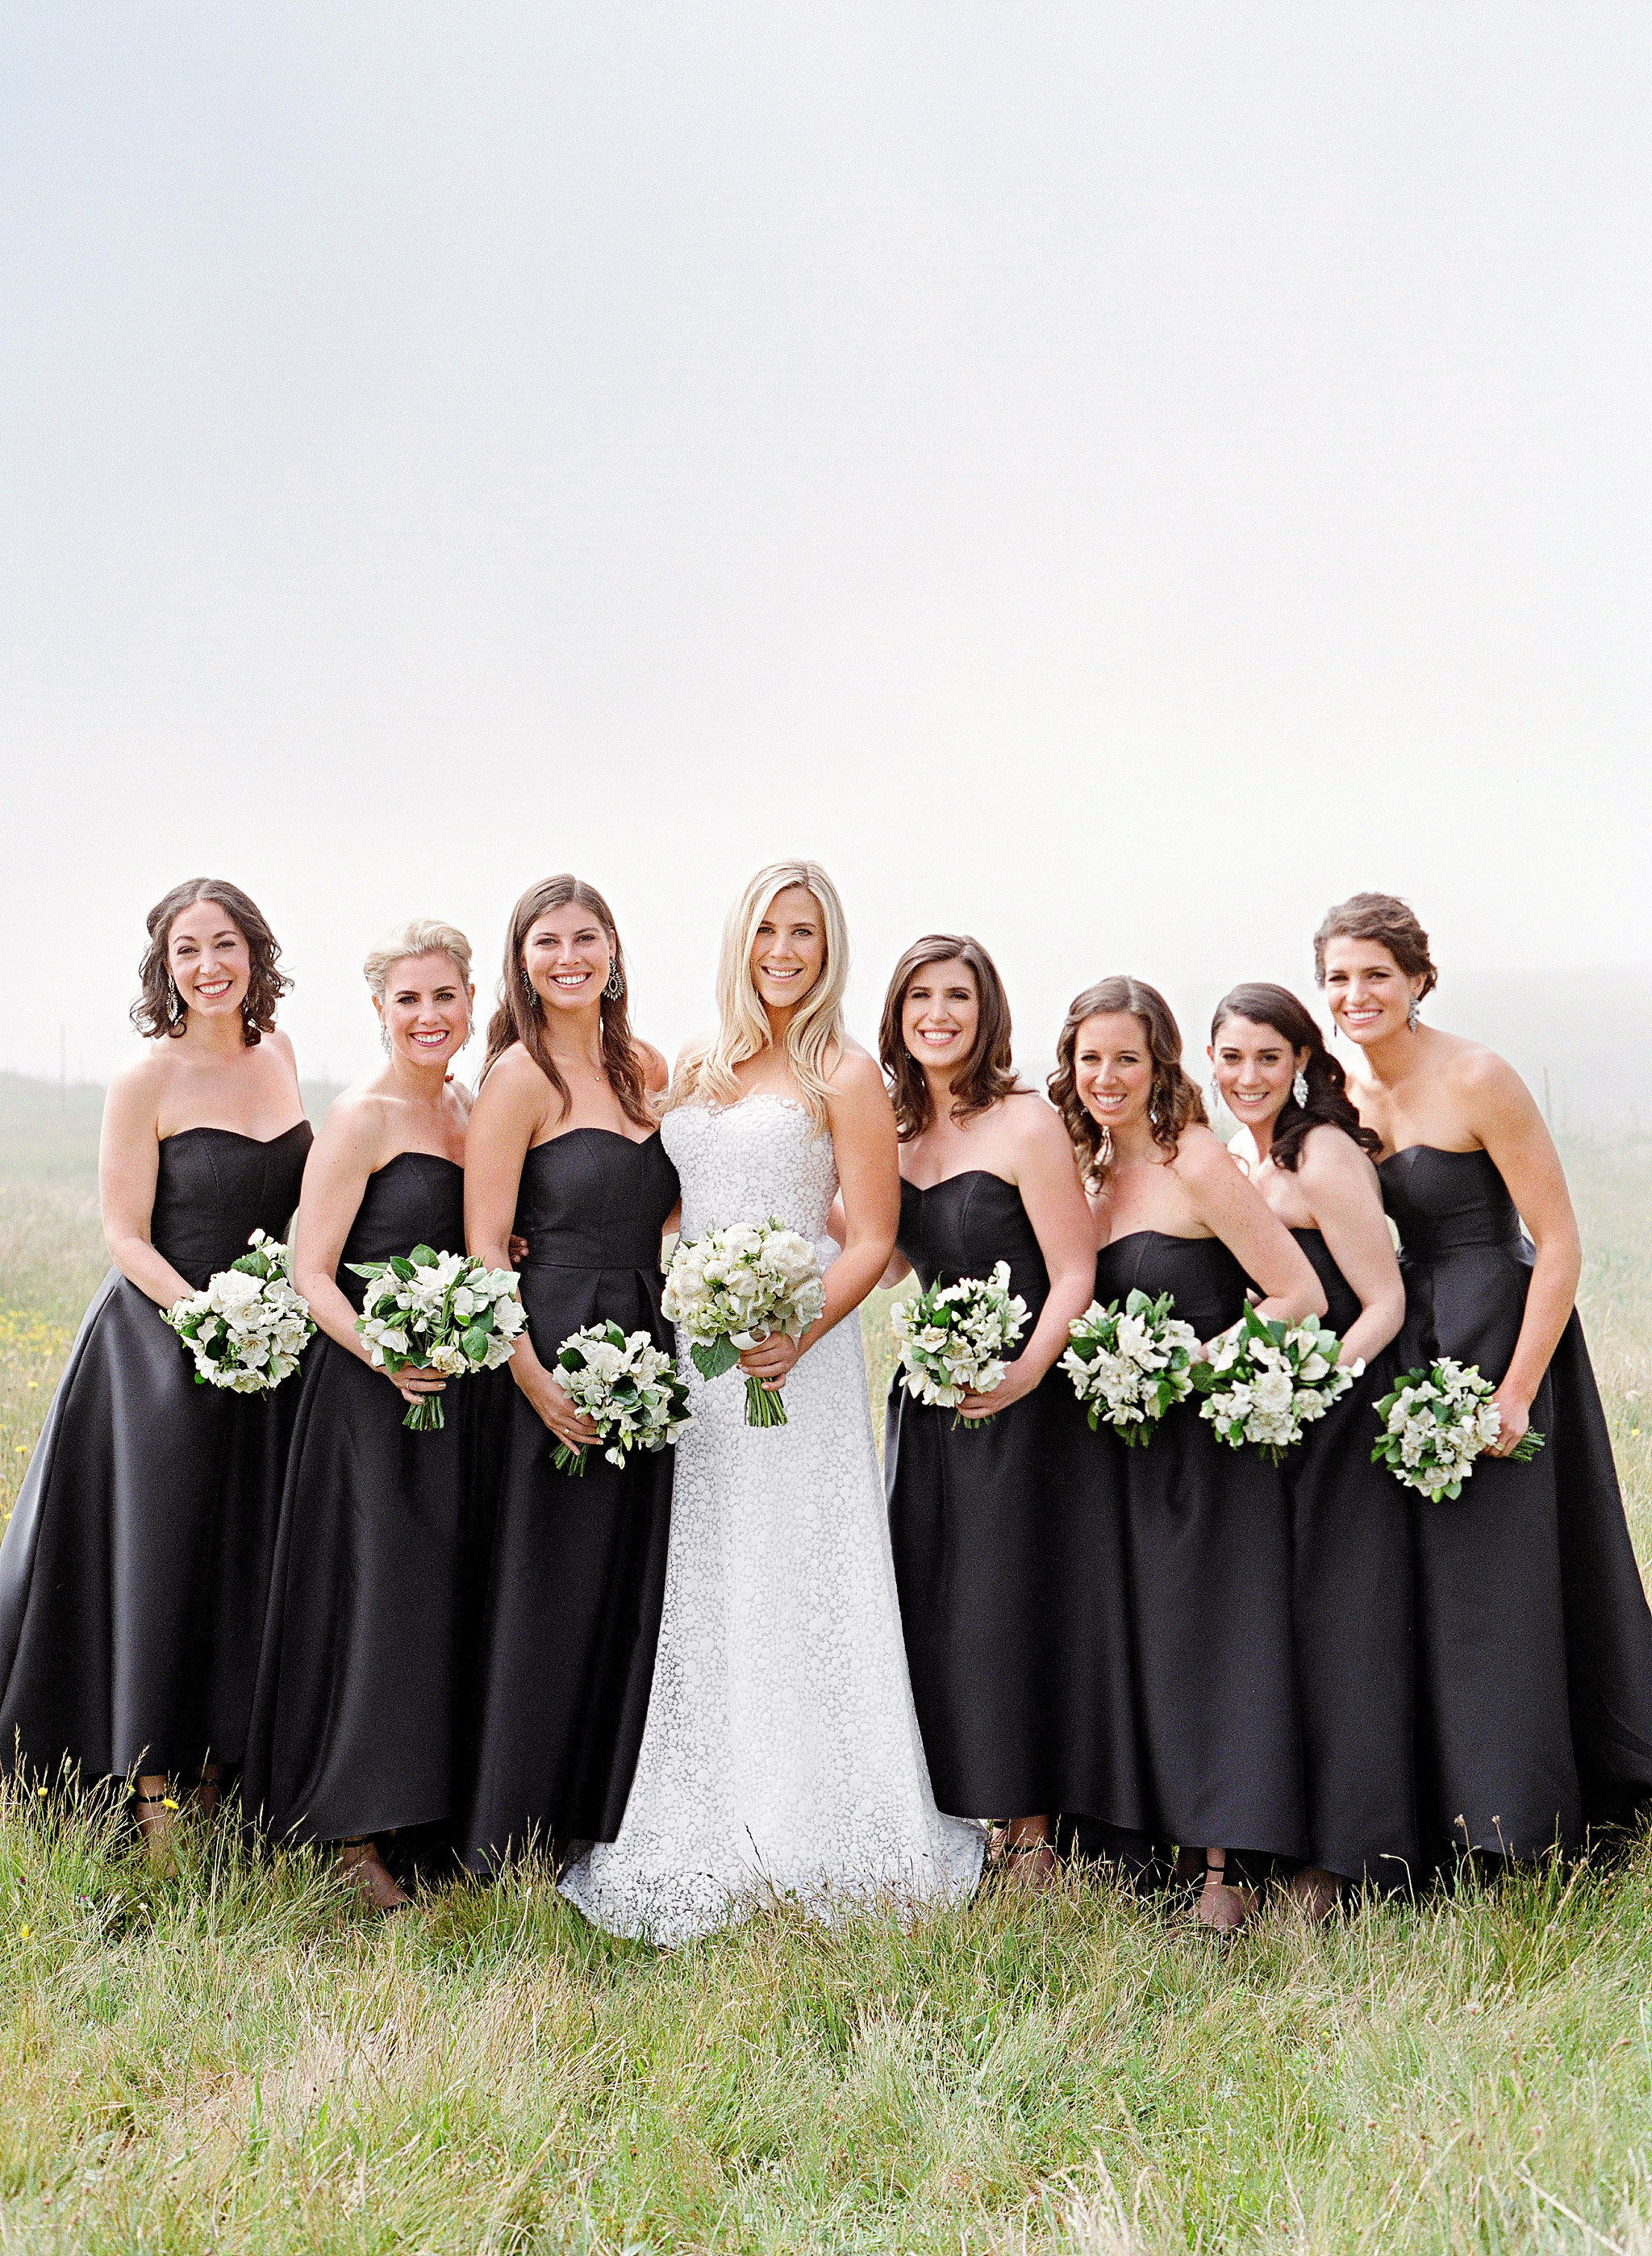 whitney zach wedding bridesmaids black strapless dresses